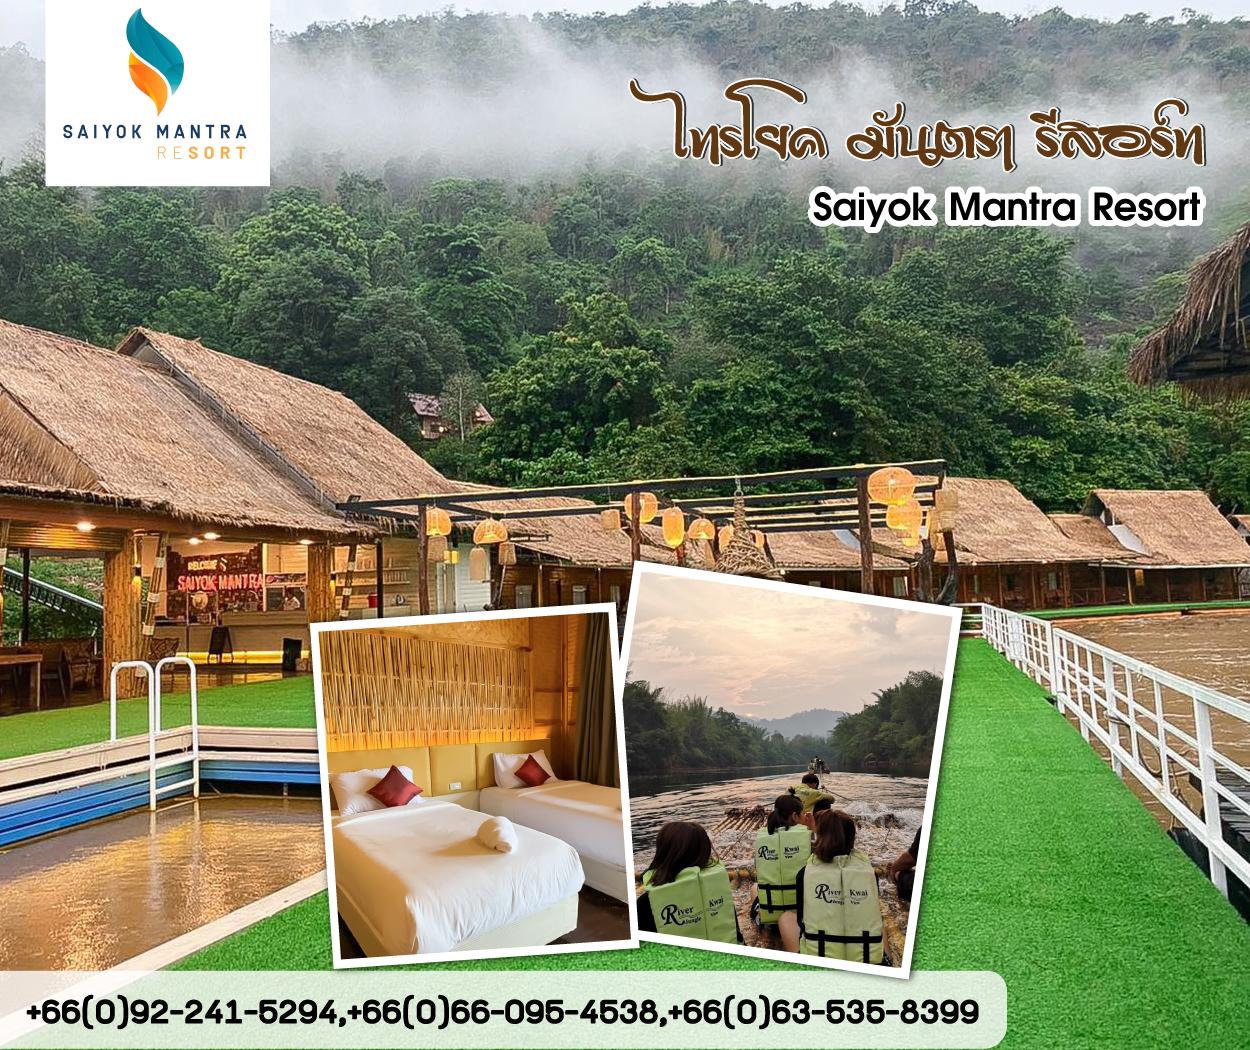 Saiyok Mantra Resort Kanchanaburi